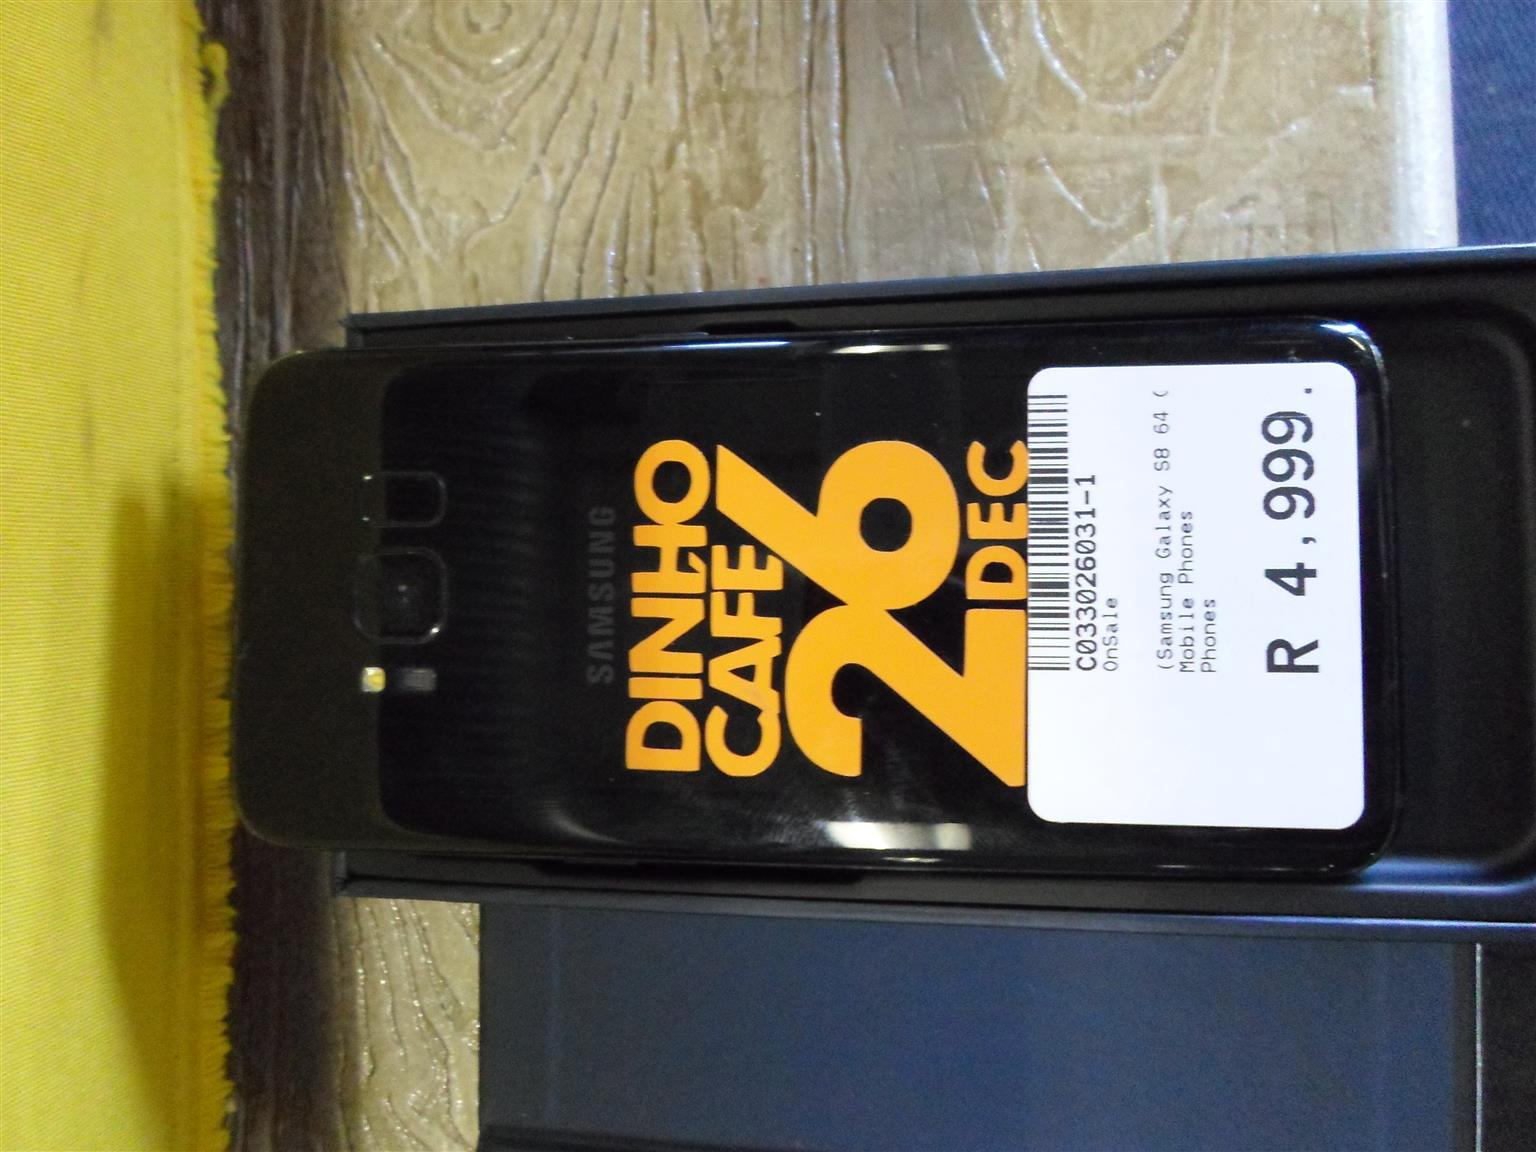 64GB Samsung S8 Cellphone